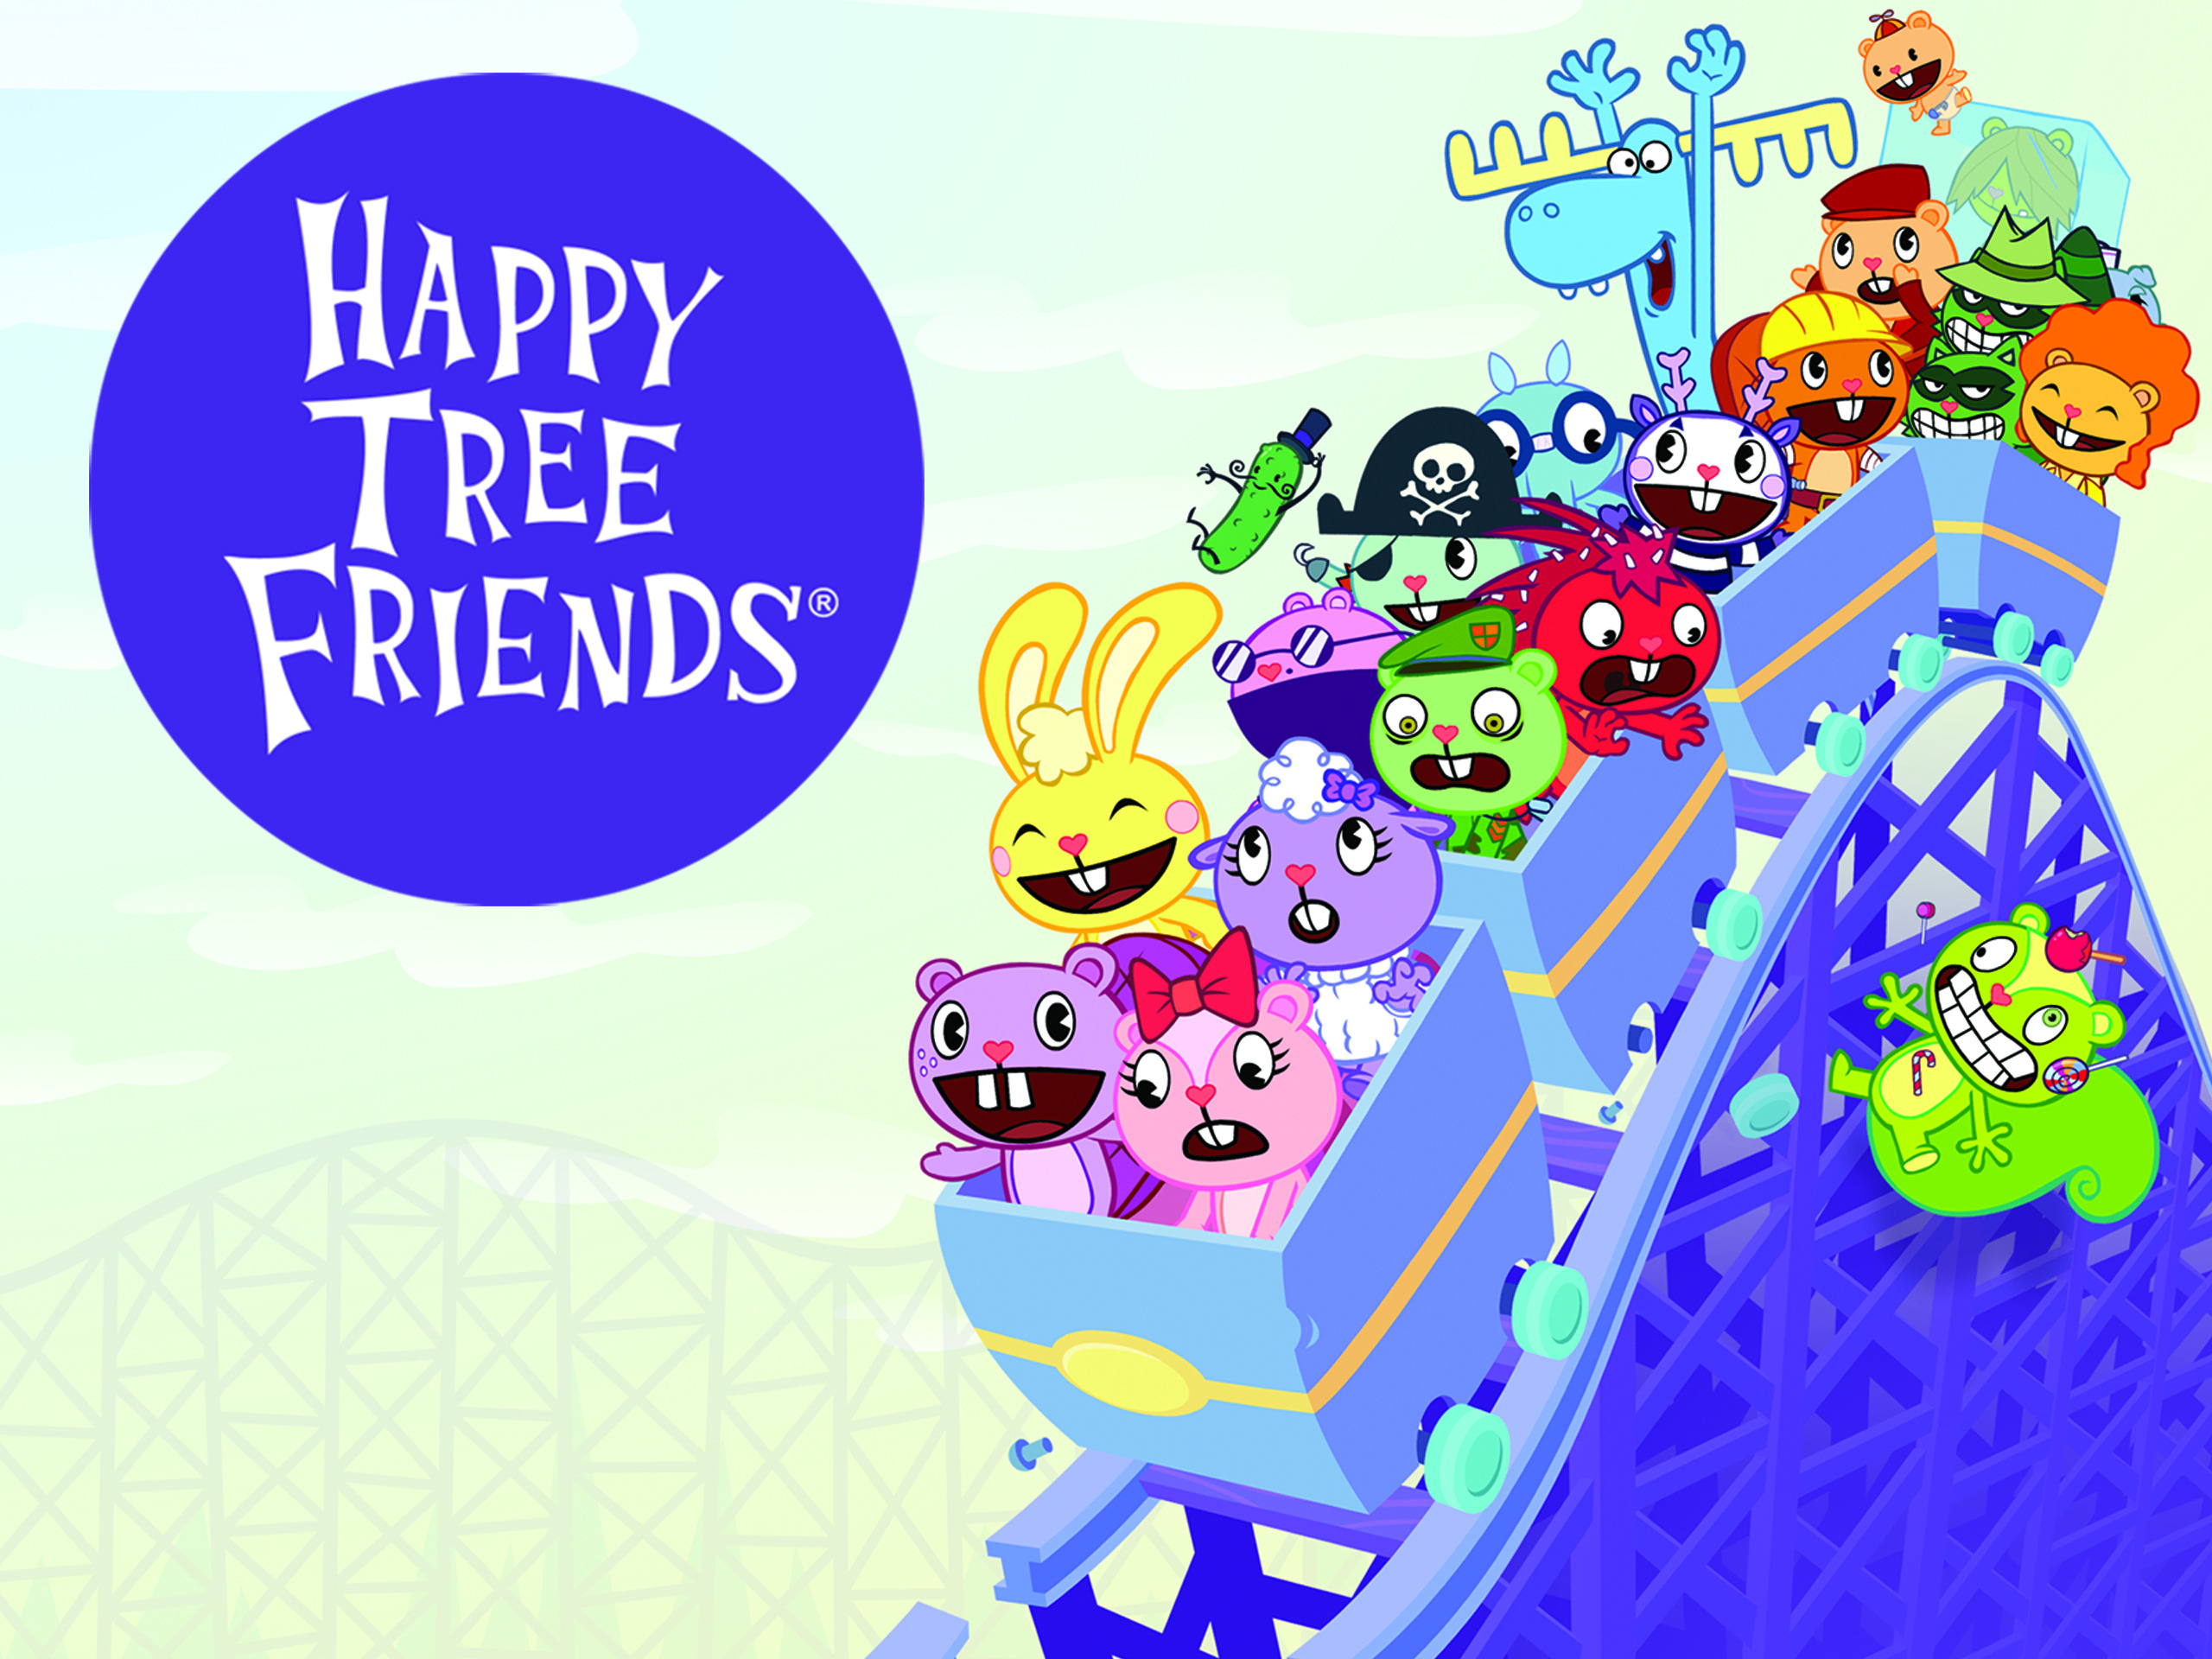 Watch Happy Tree Friends Season 1 Episode 11: Good and Nice